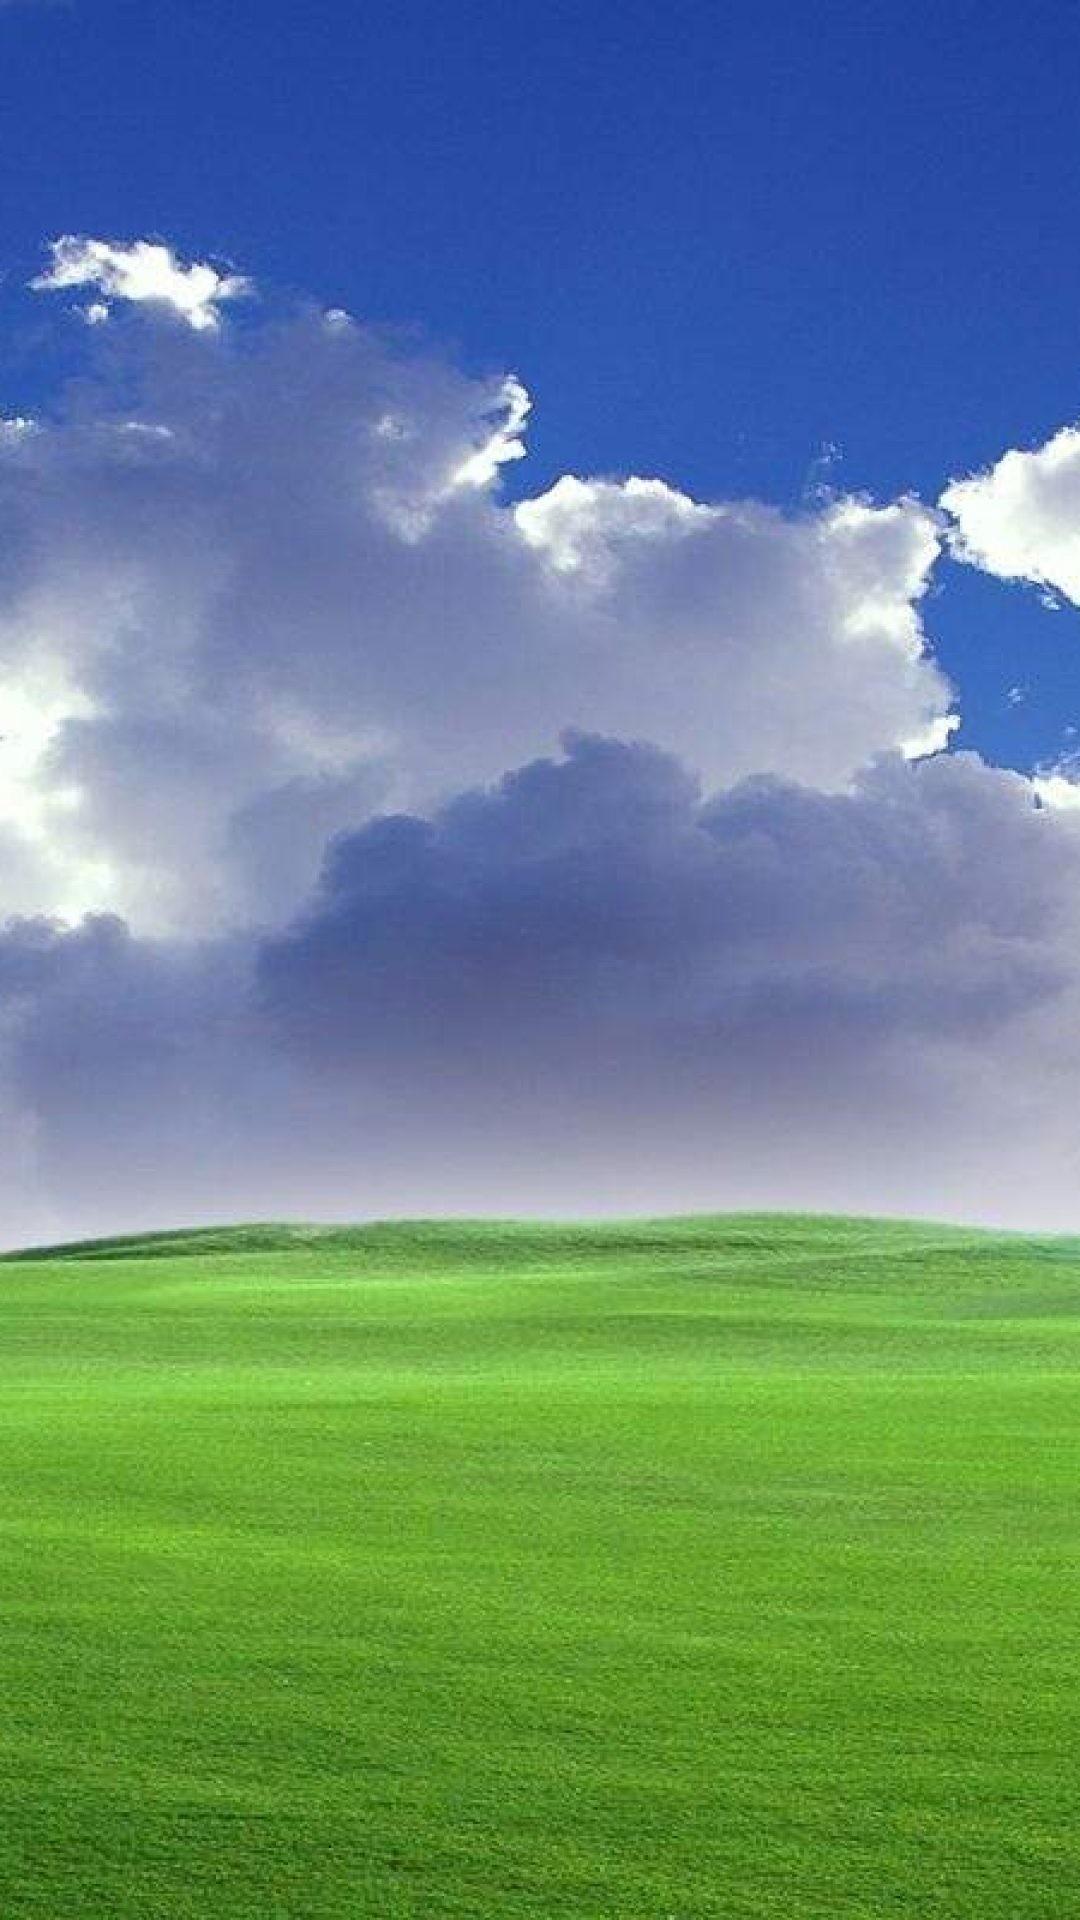 Animated Wallpapers For Desktop Windows Xp Free Download Windows Xp Wallpaper 48 Immagini